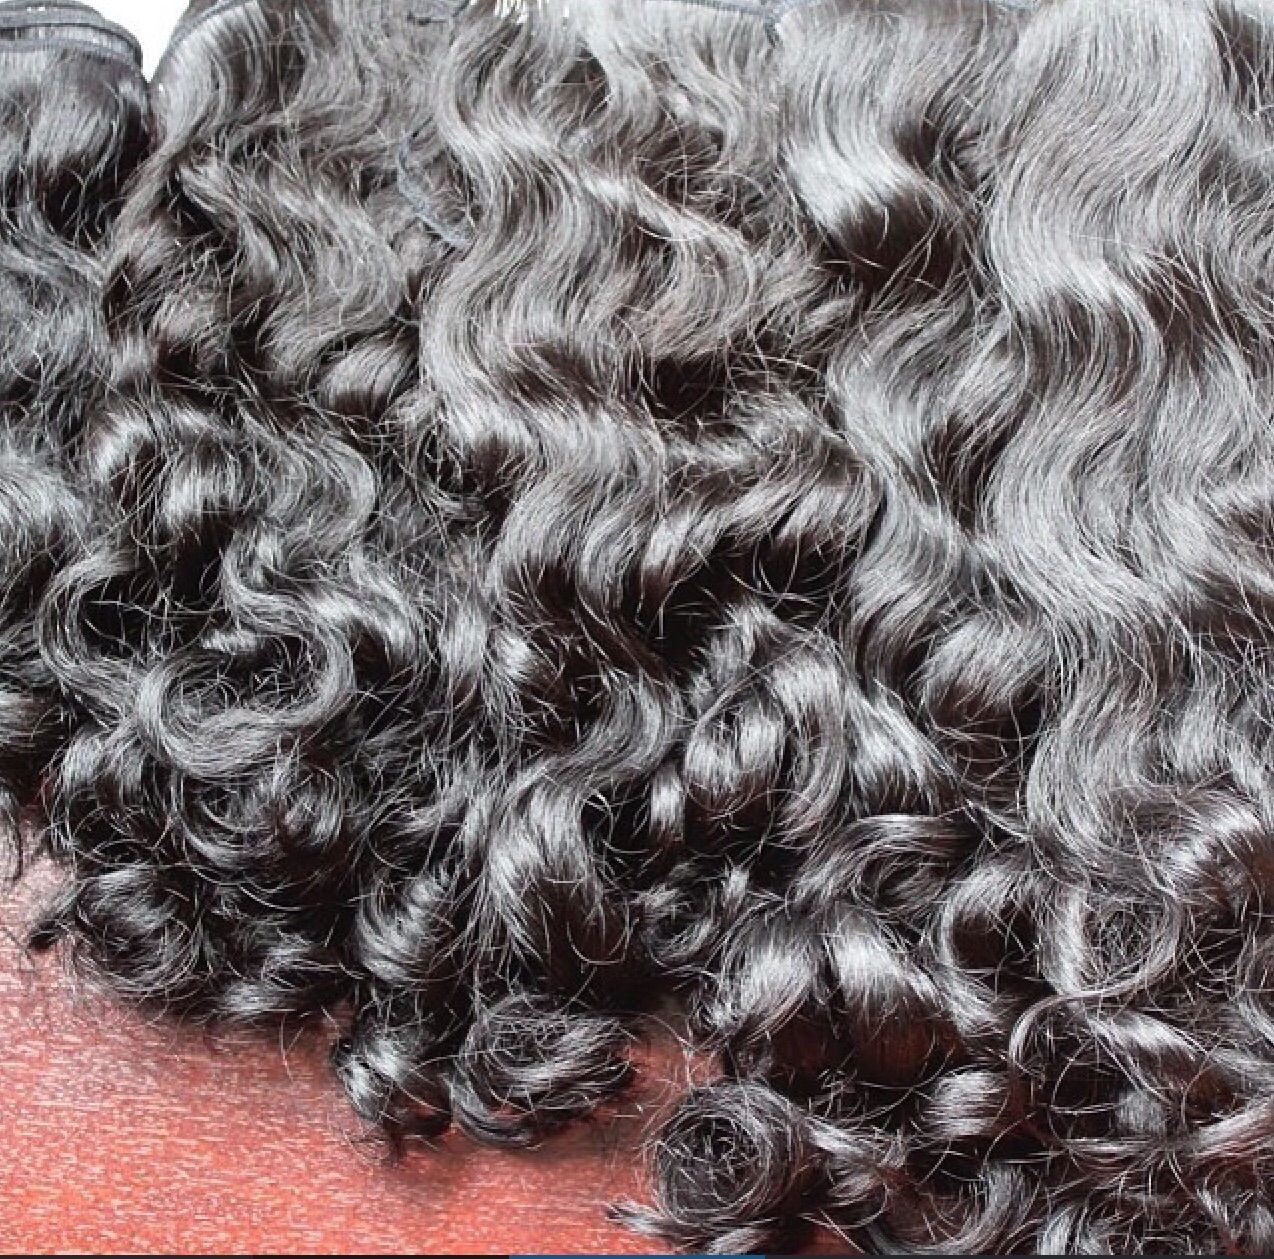 Vlore Pure Curly Vloreluxuryloks Affordable Hair Extensions